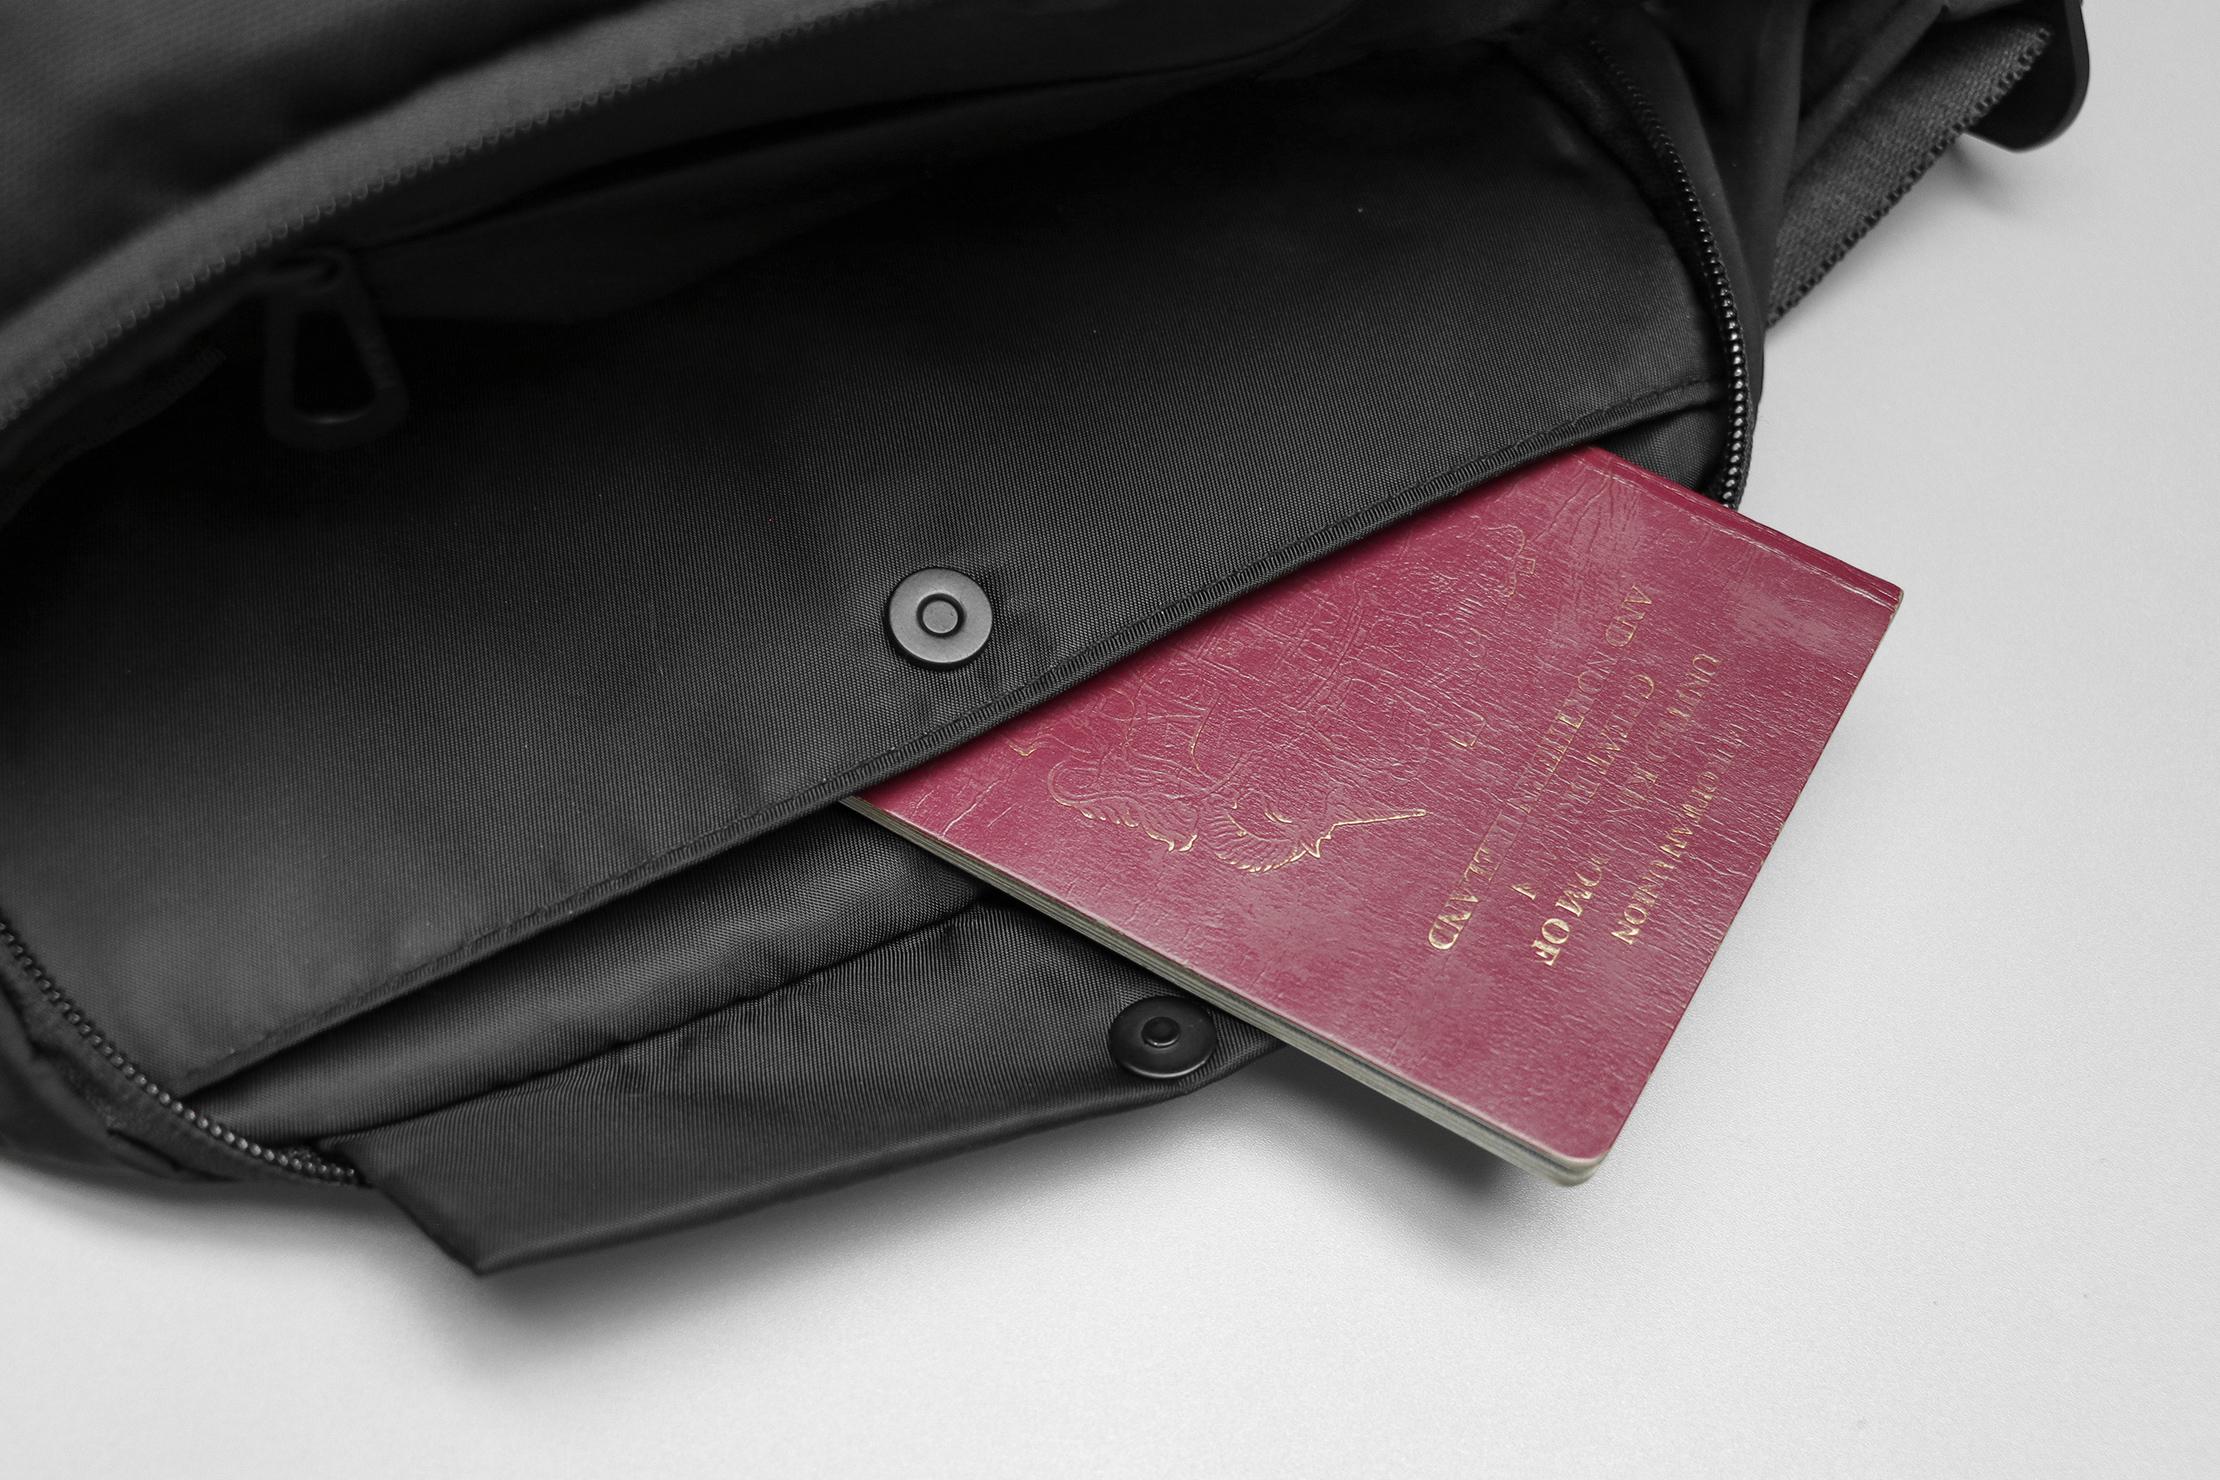 Côte&Ciel Isarau Small Passport In The Popper Pocket